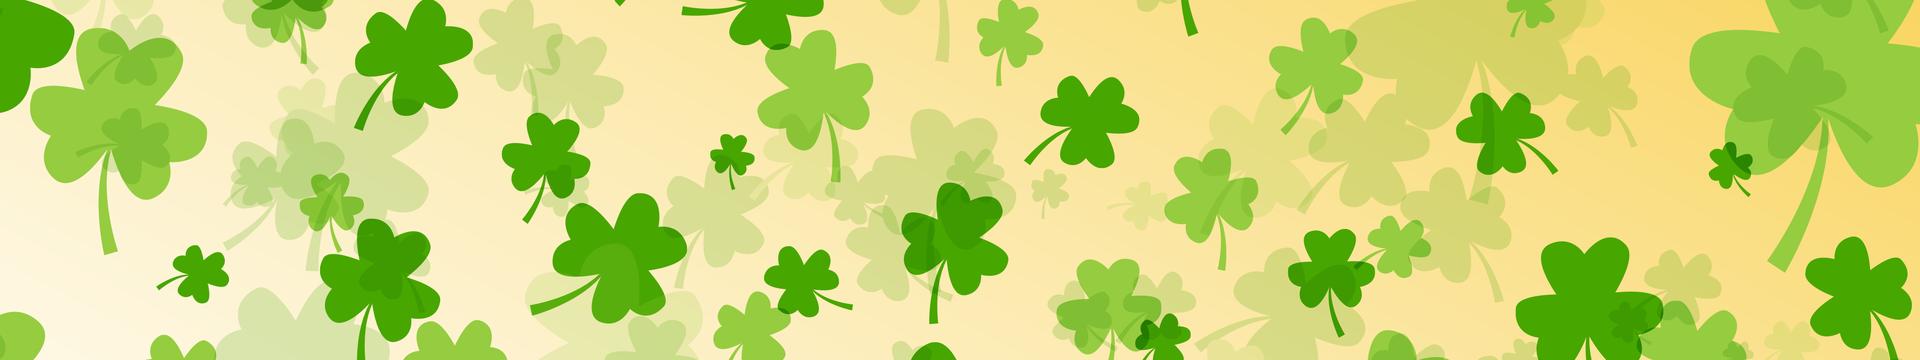 St. Patrick's Day shamrock - Westgate Resorts